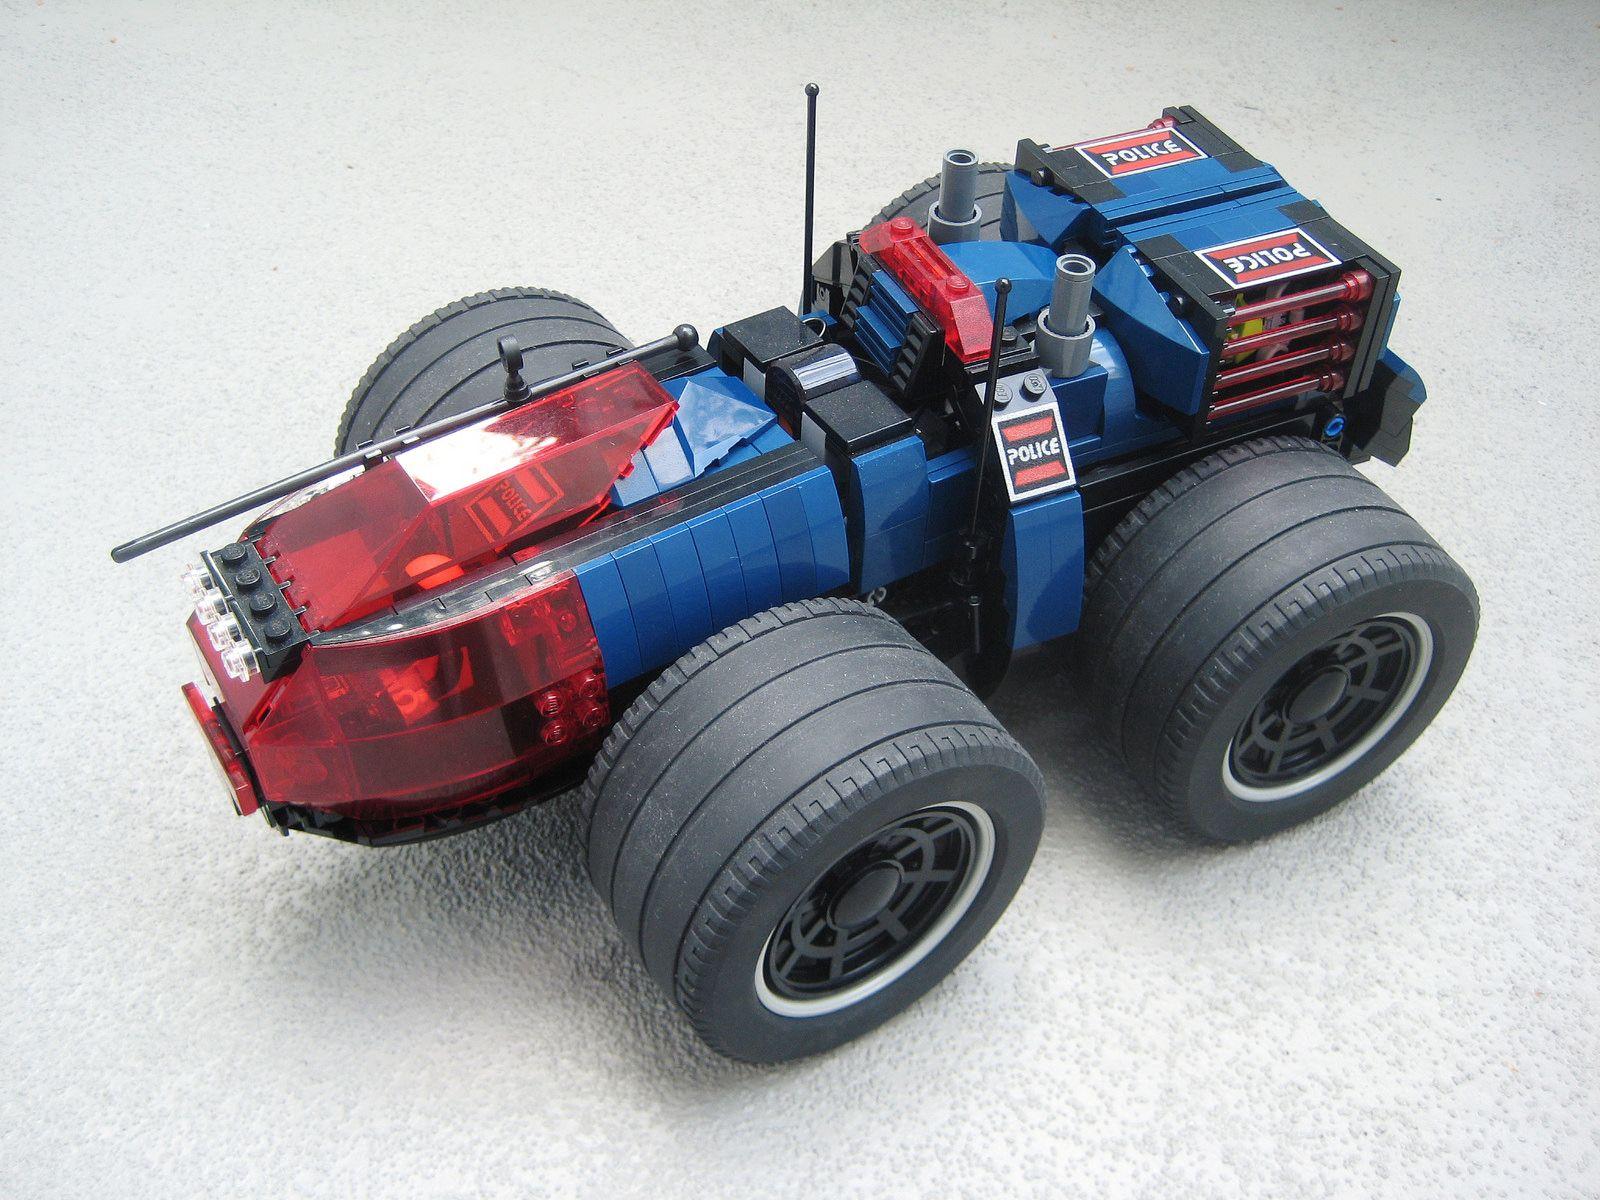 Neo Space Police I 6895 Redux Lego Wheels Lego Cars Lego Space Police